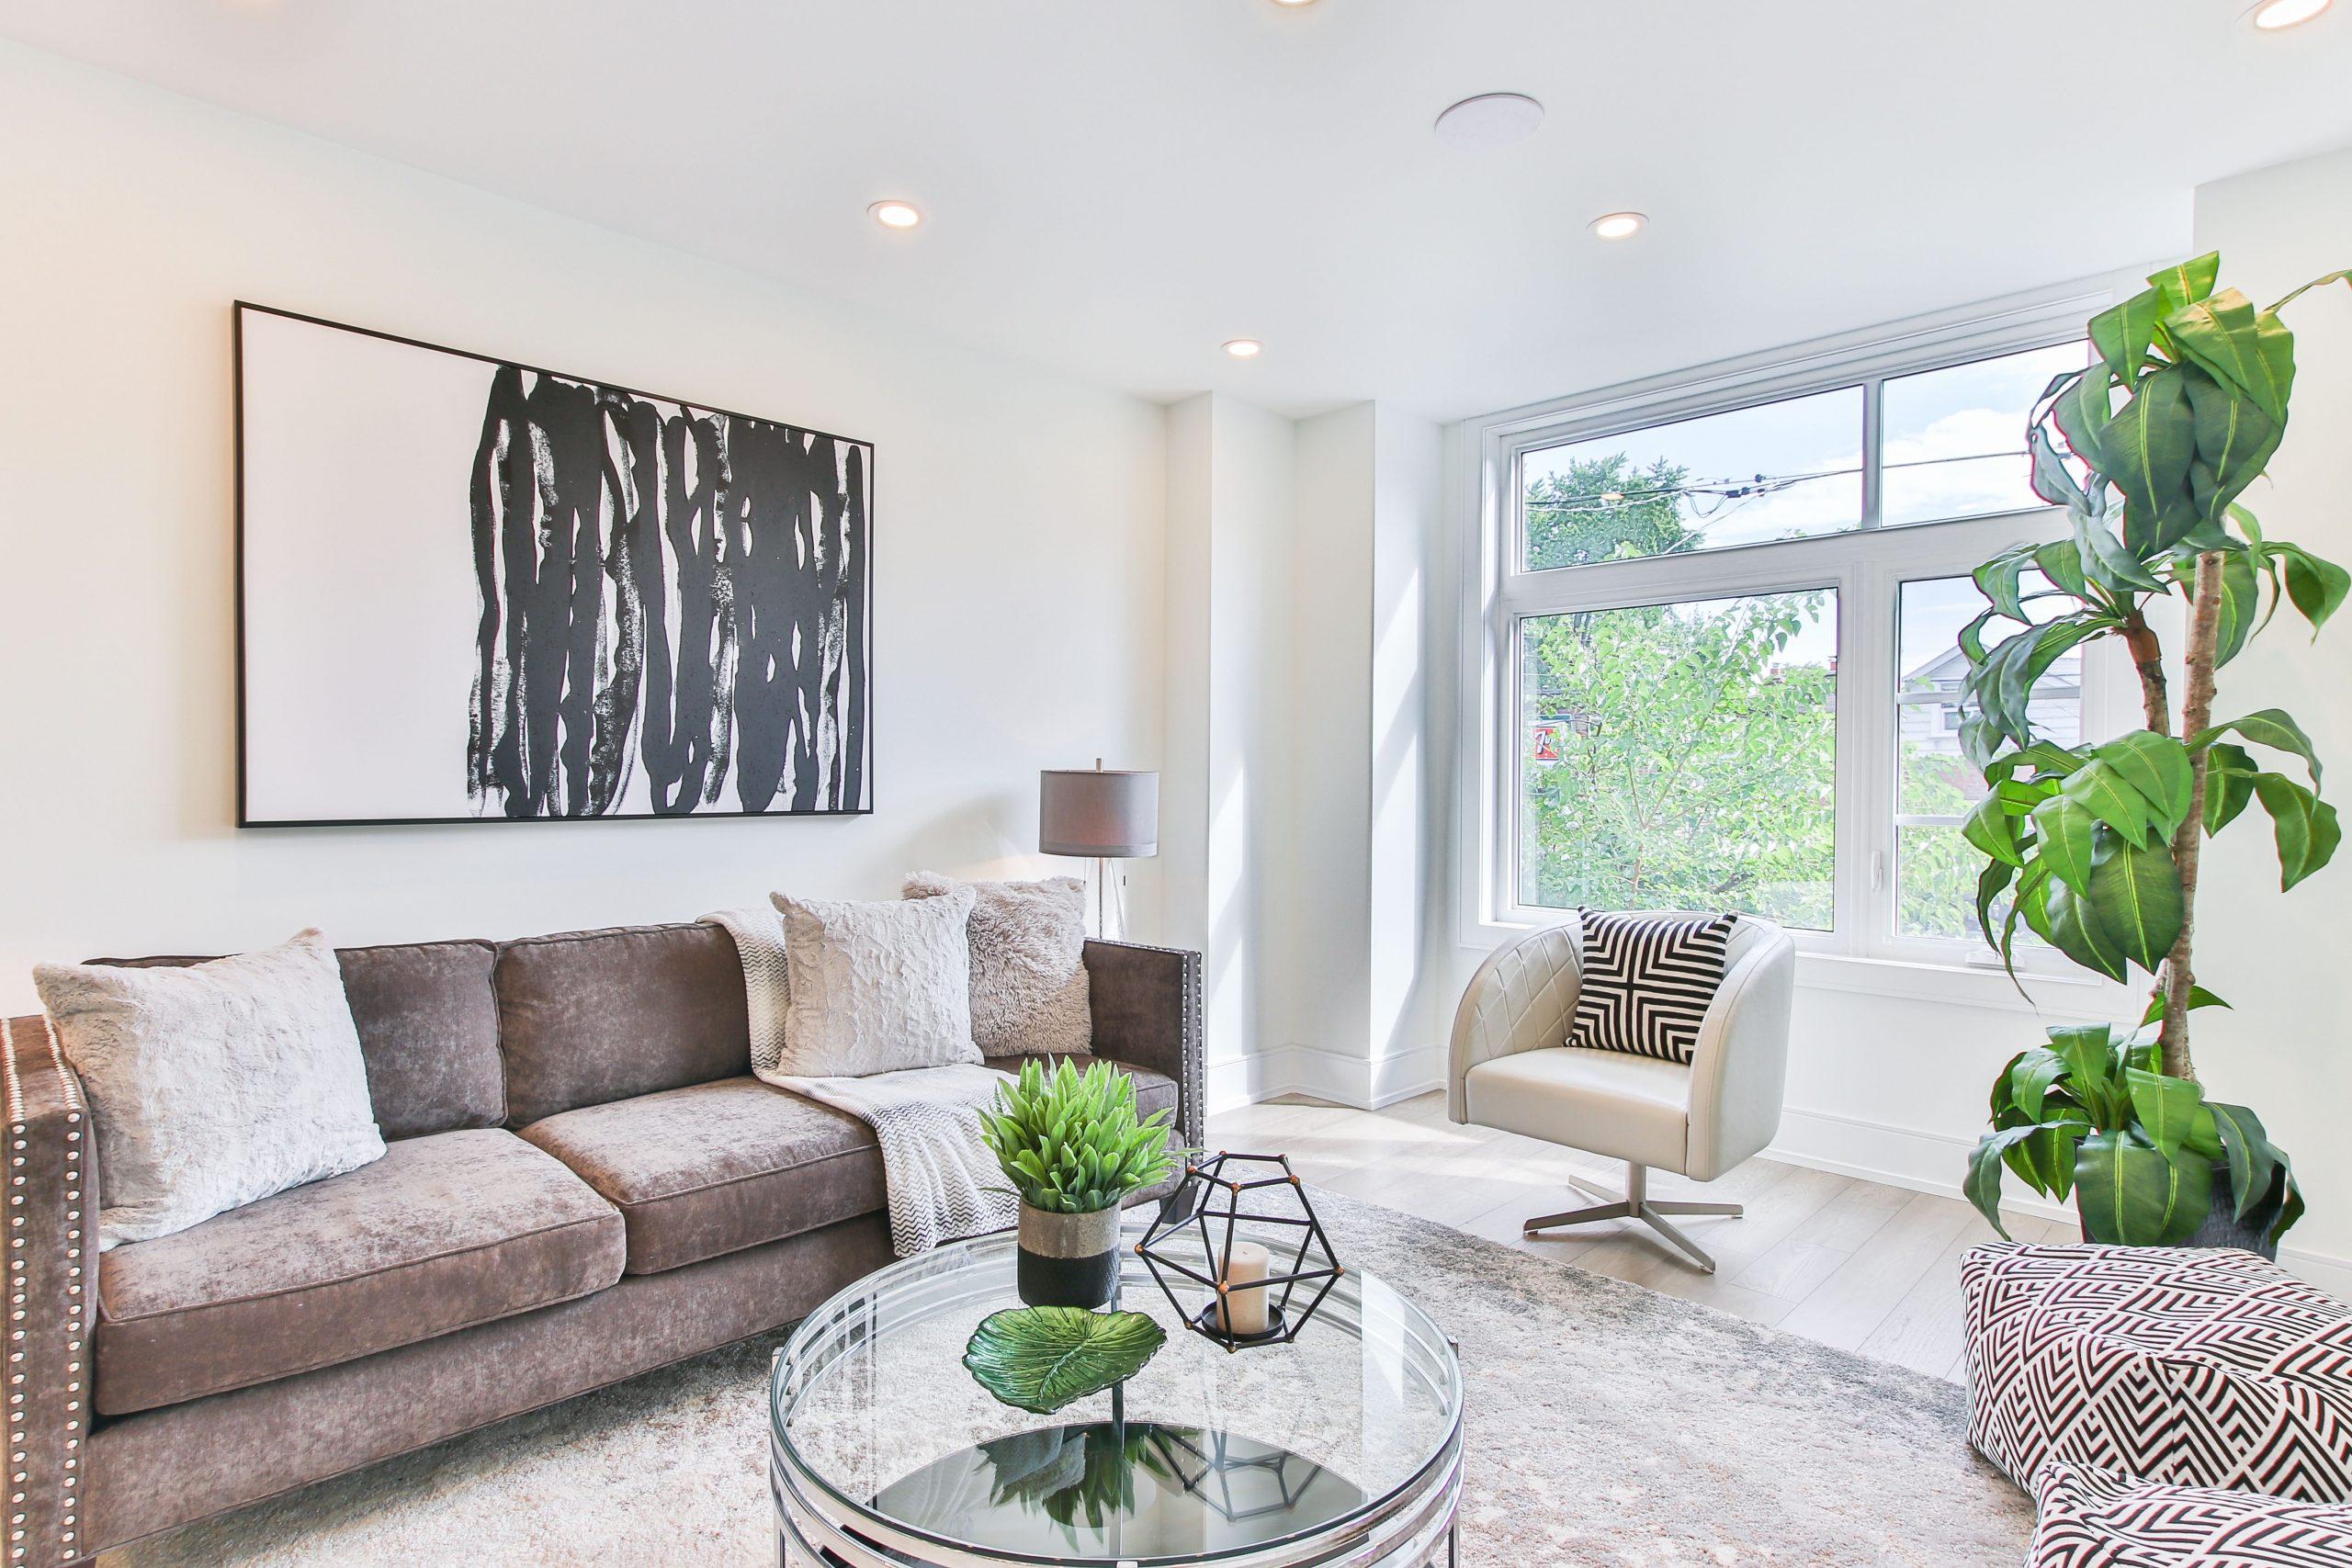 Living Room Design in 2021